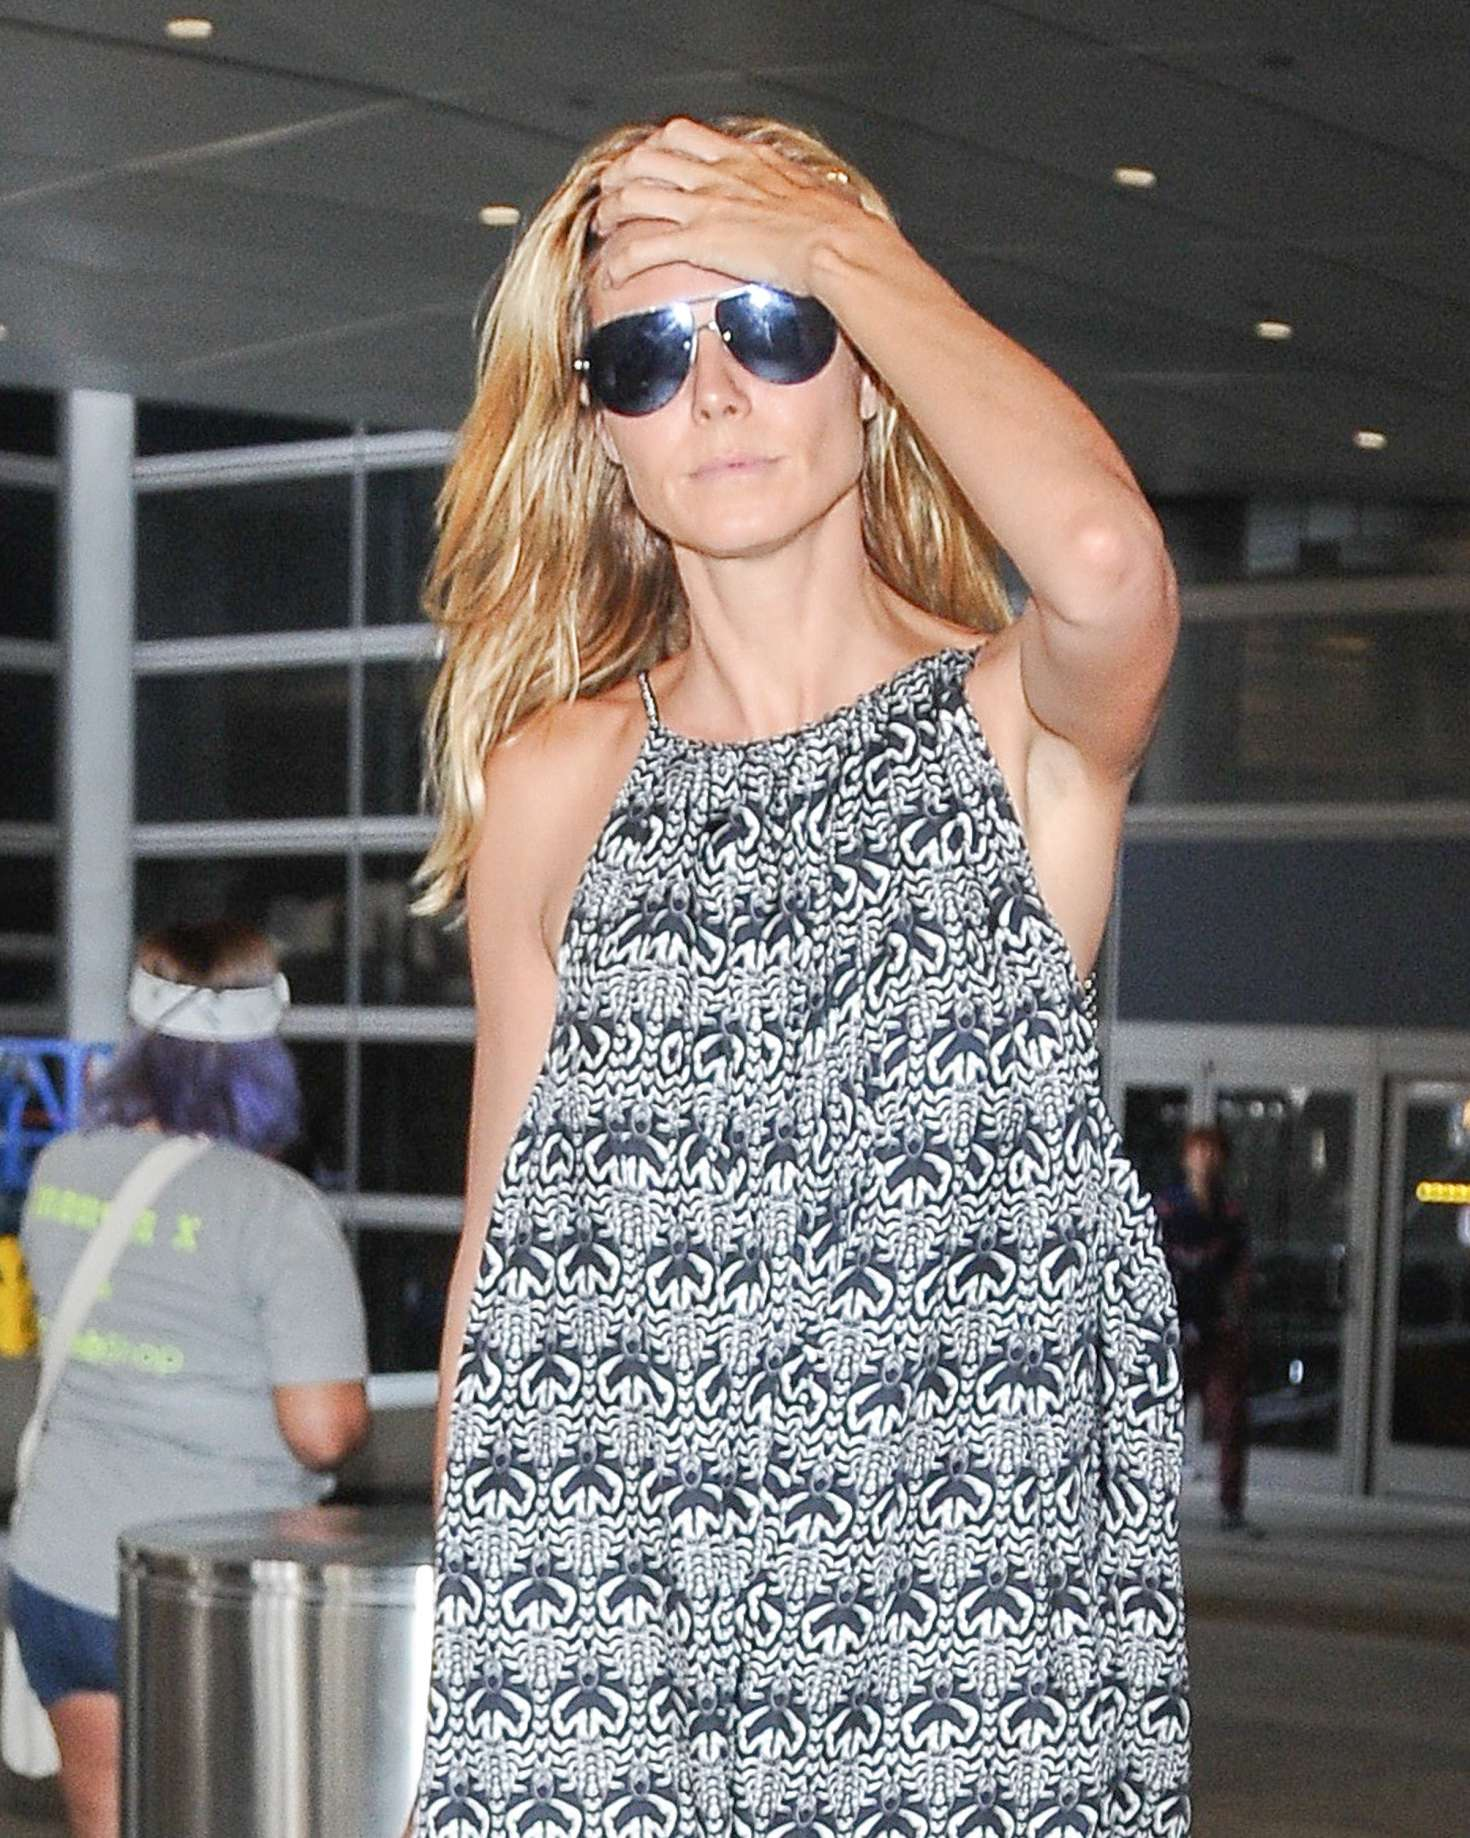 Heidi Klum at LAX Airport in Los Angeles